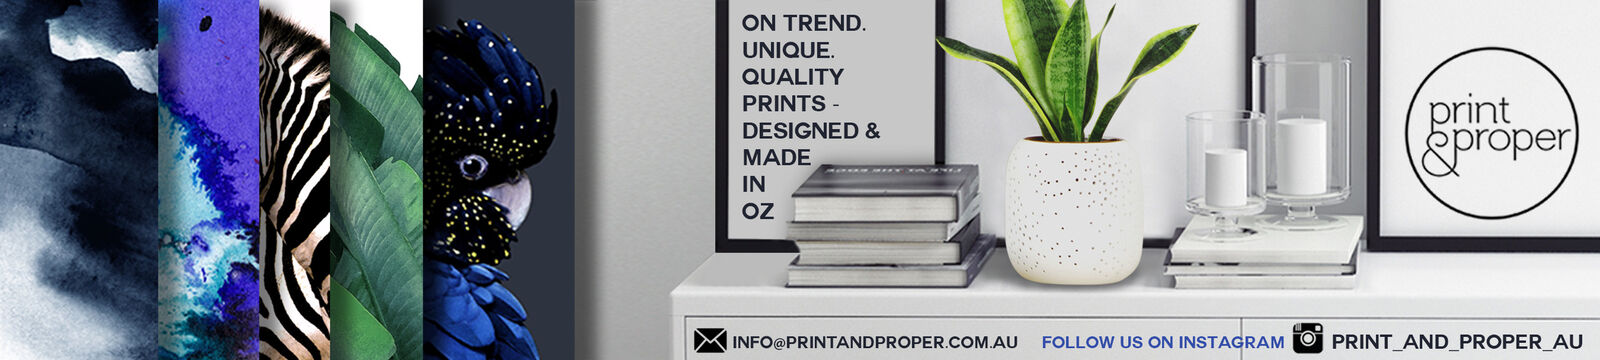 print and proper